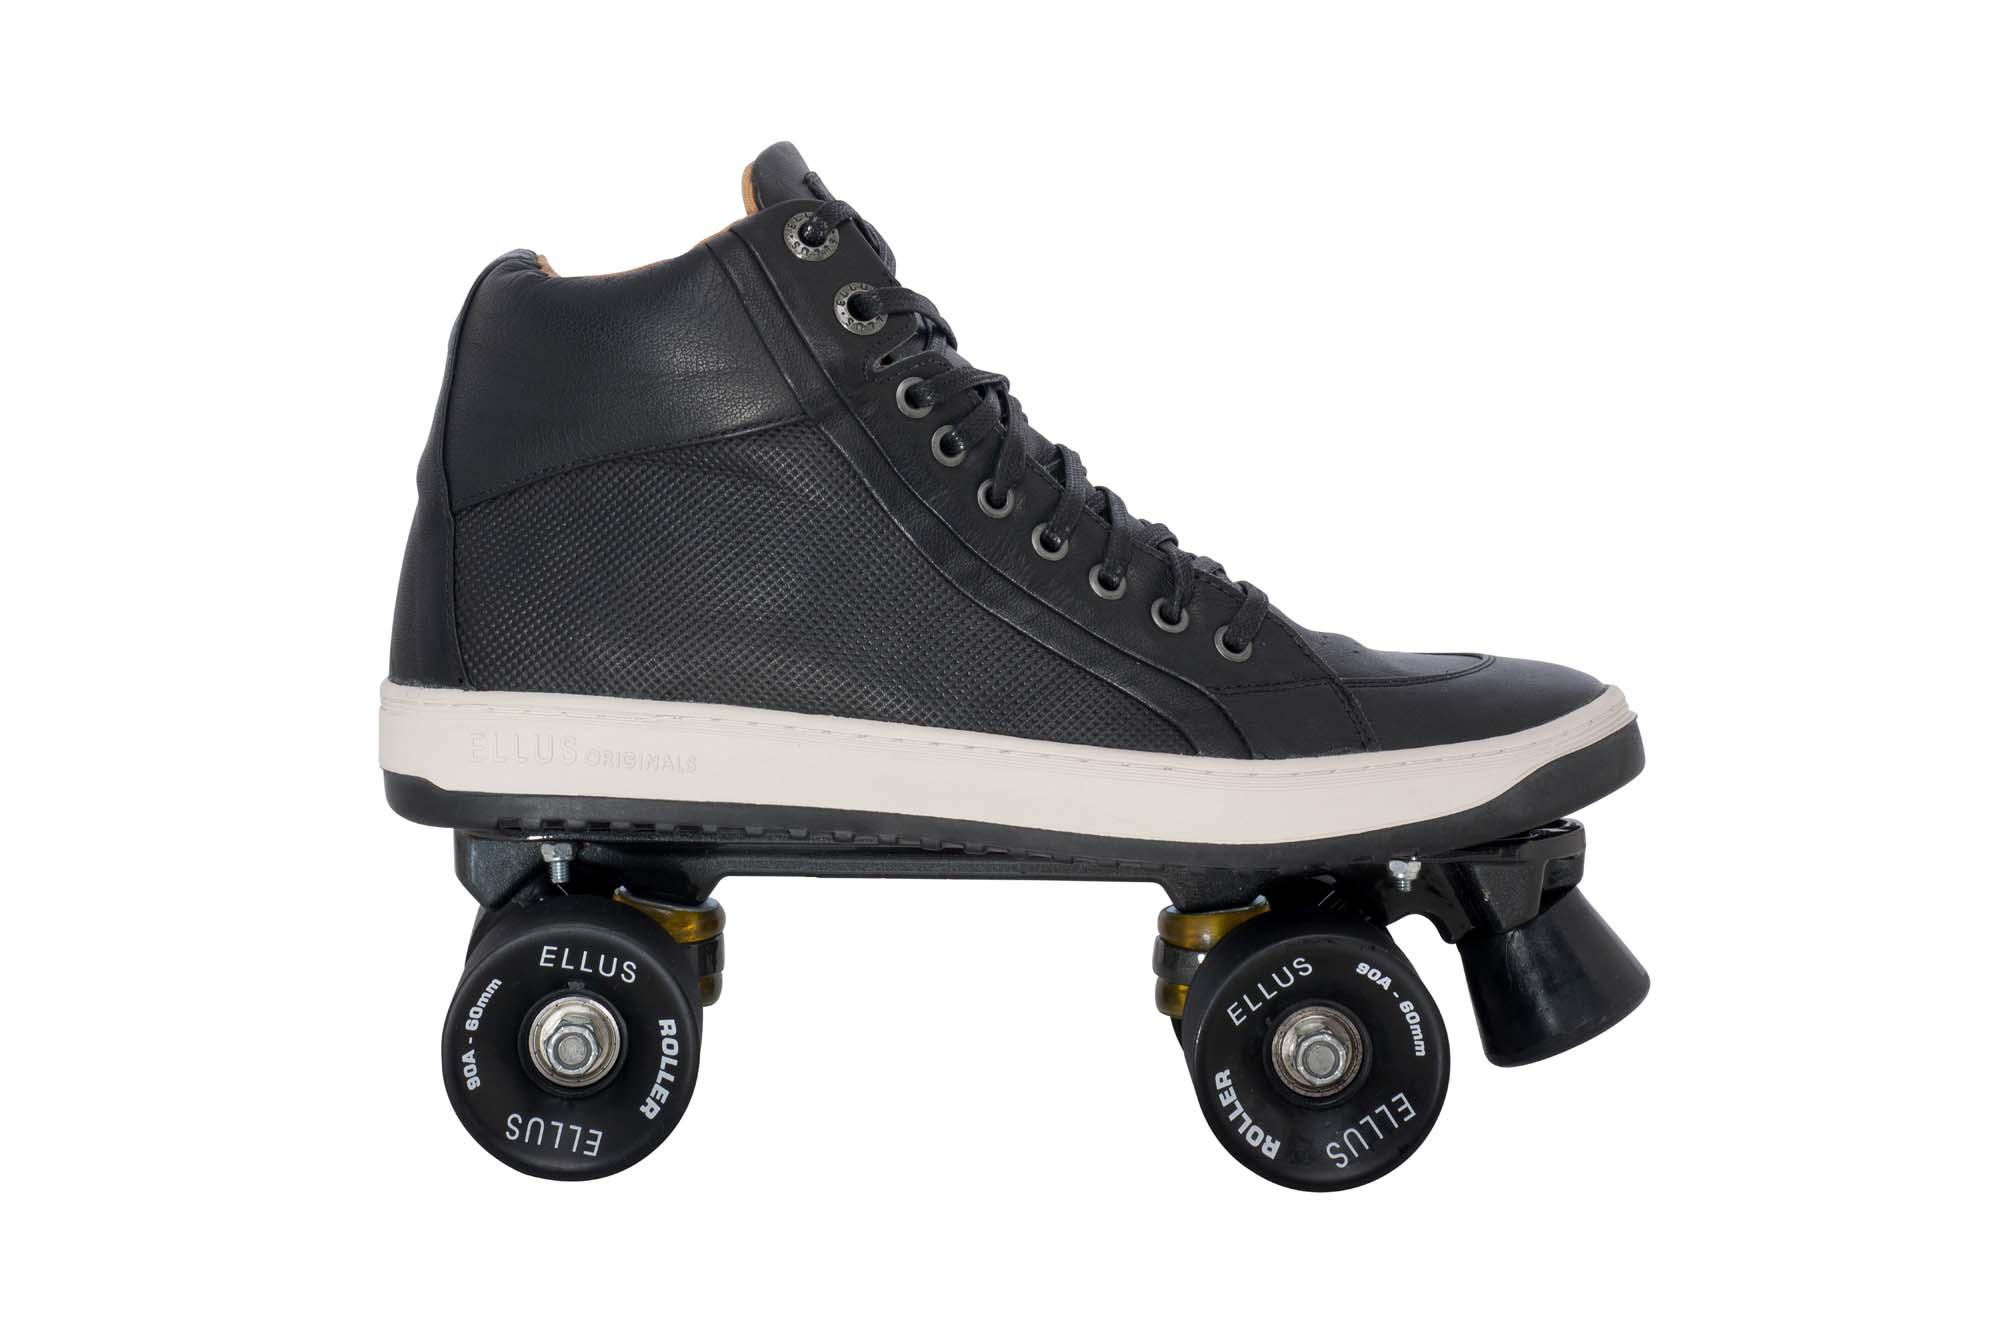 Campanha Ellus SPORTDLX Inverno 16, ellus, alex cursino, moda sem censura, digital influencer, onde comprar roller, onde comprar patins, moda masculina, fashion blogger, menswear, campanha